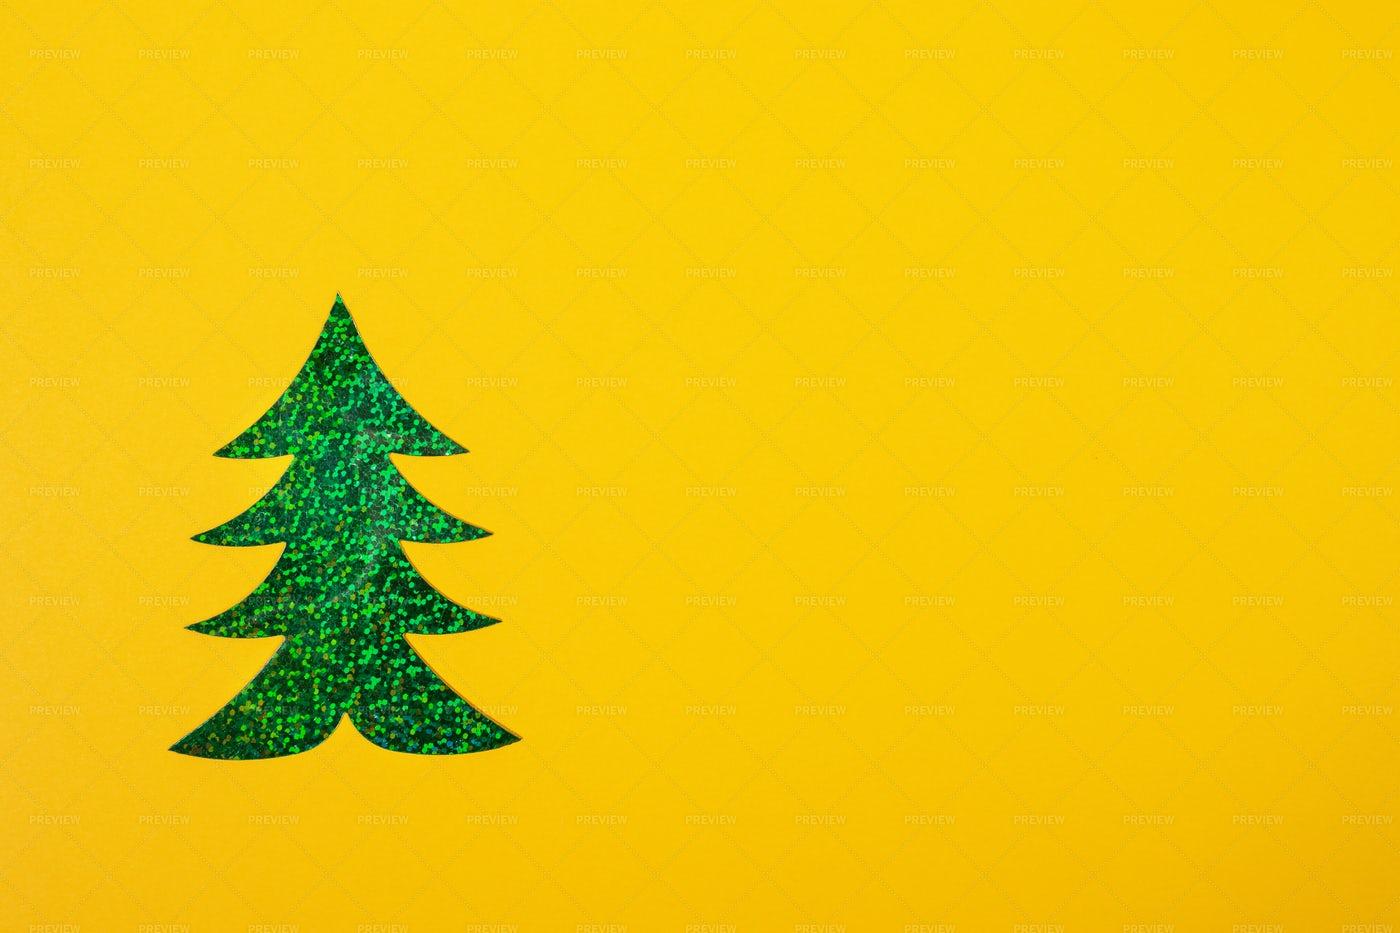 Shinny Paper Christmas Tree: Stock Photos